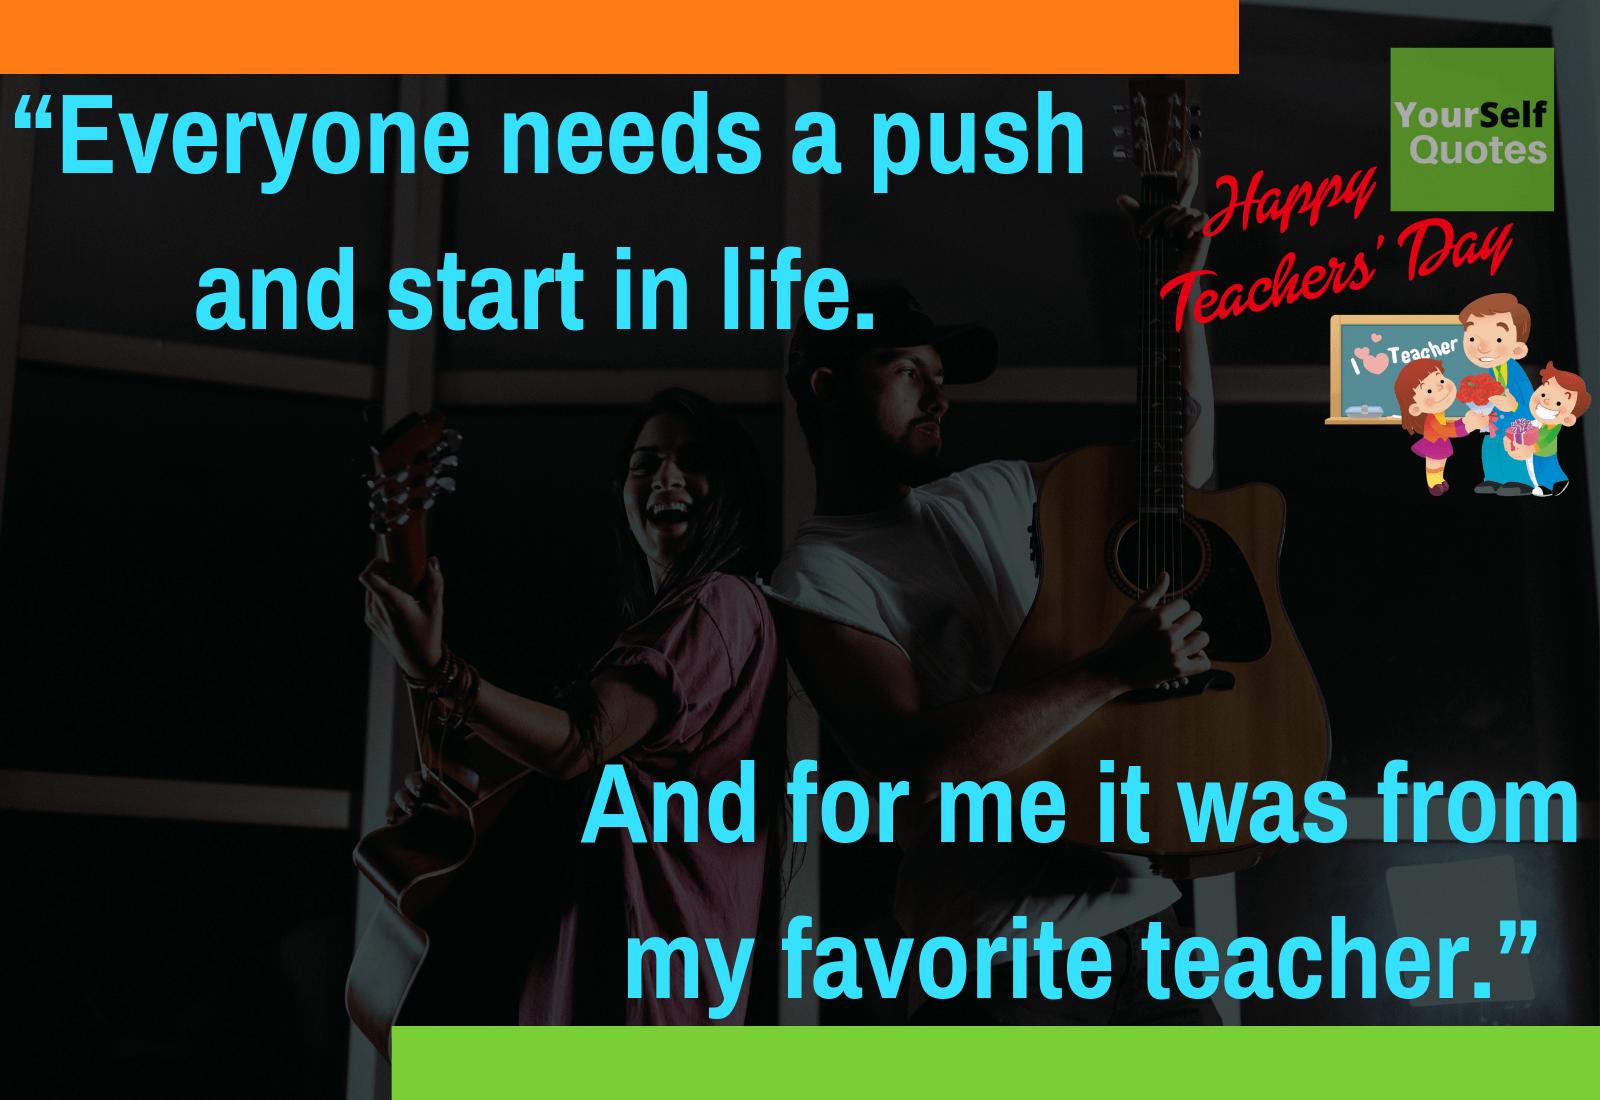 Teachers Day Wallpaper Wishes